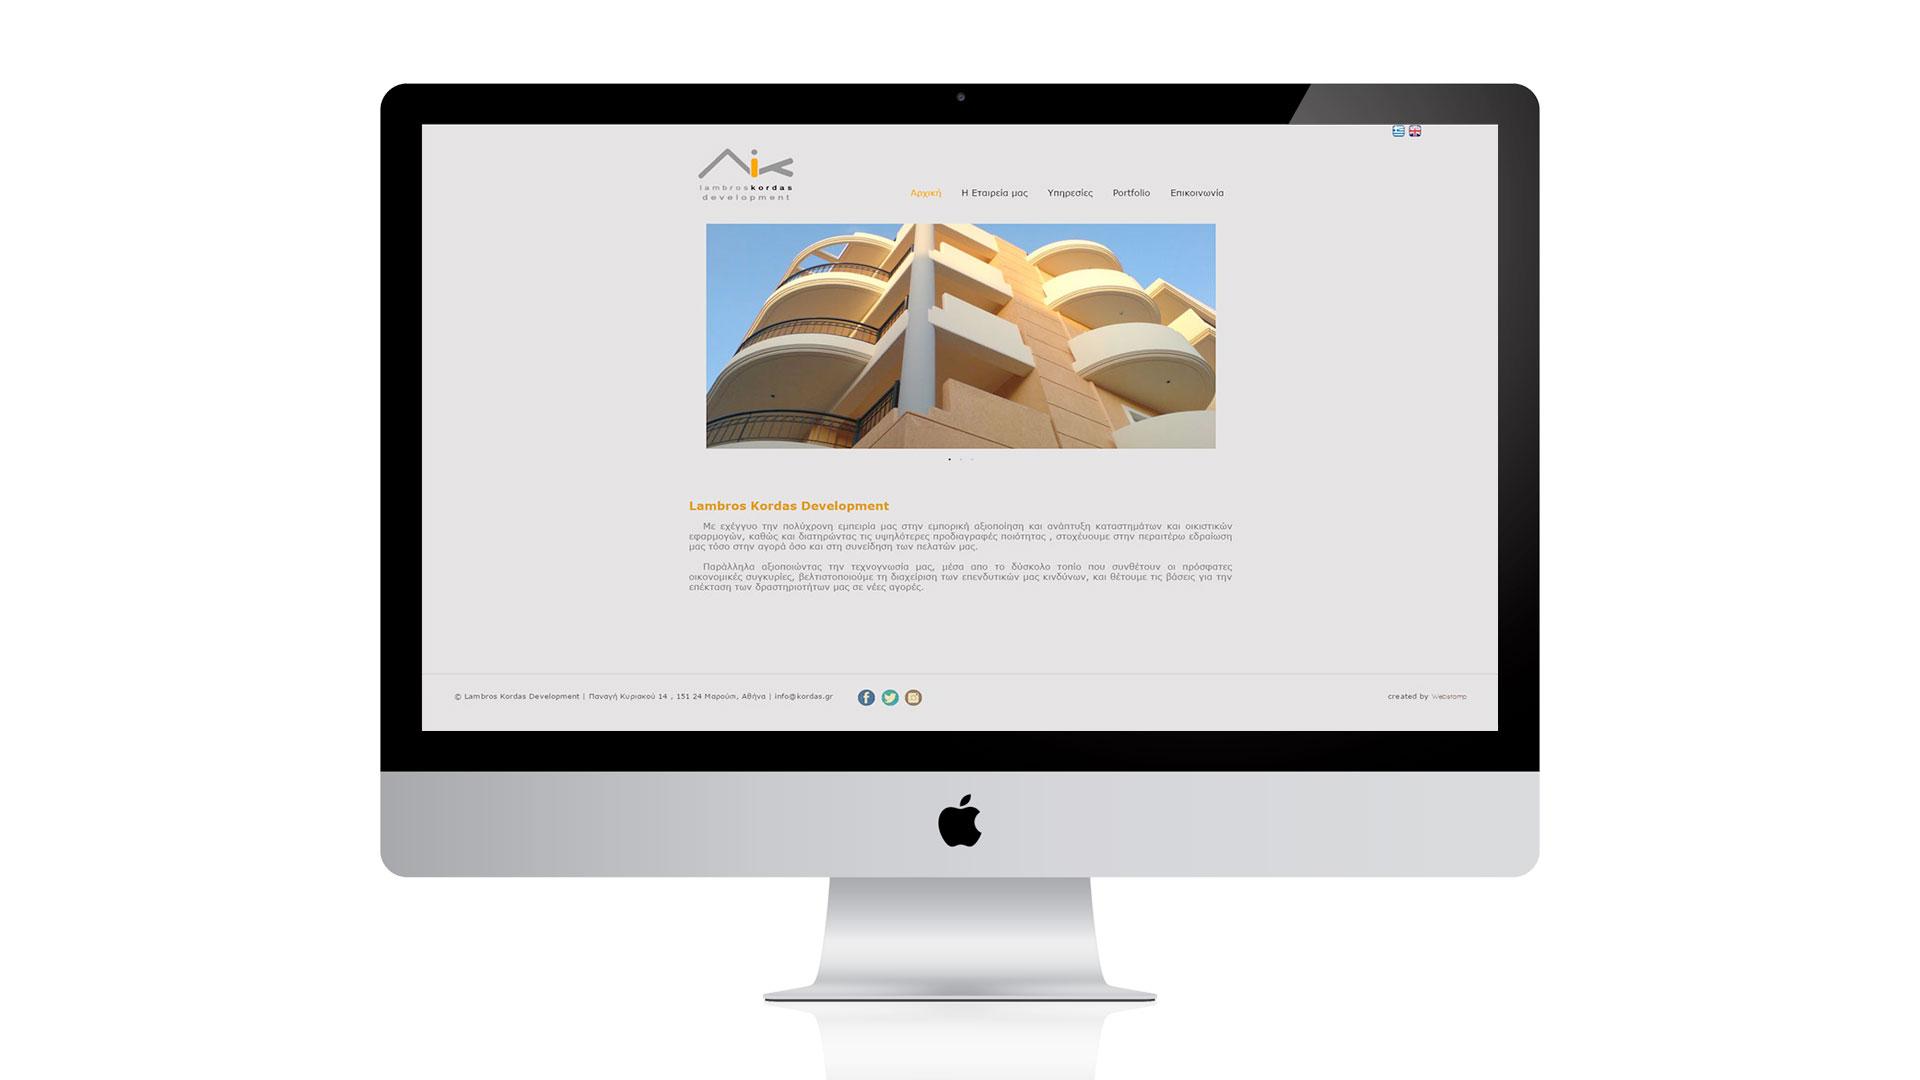 Lampros Kordas Development home page